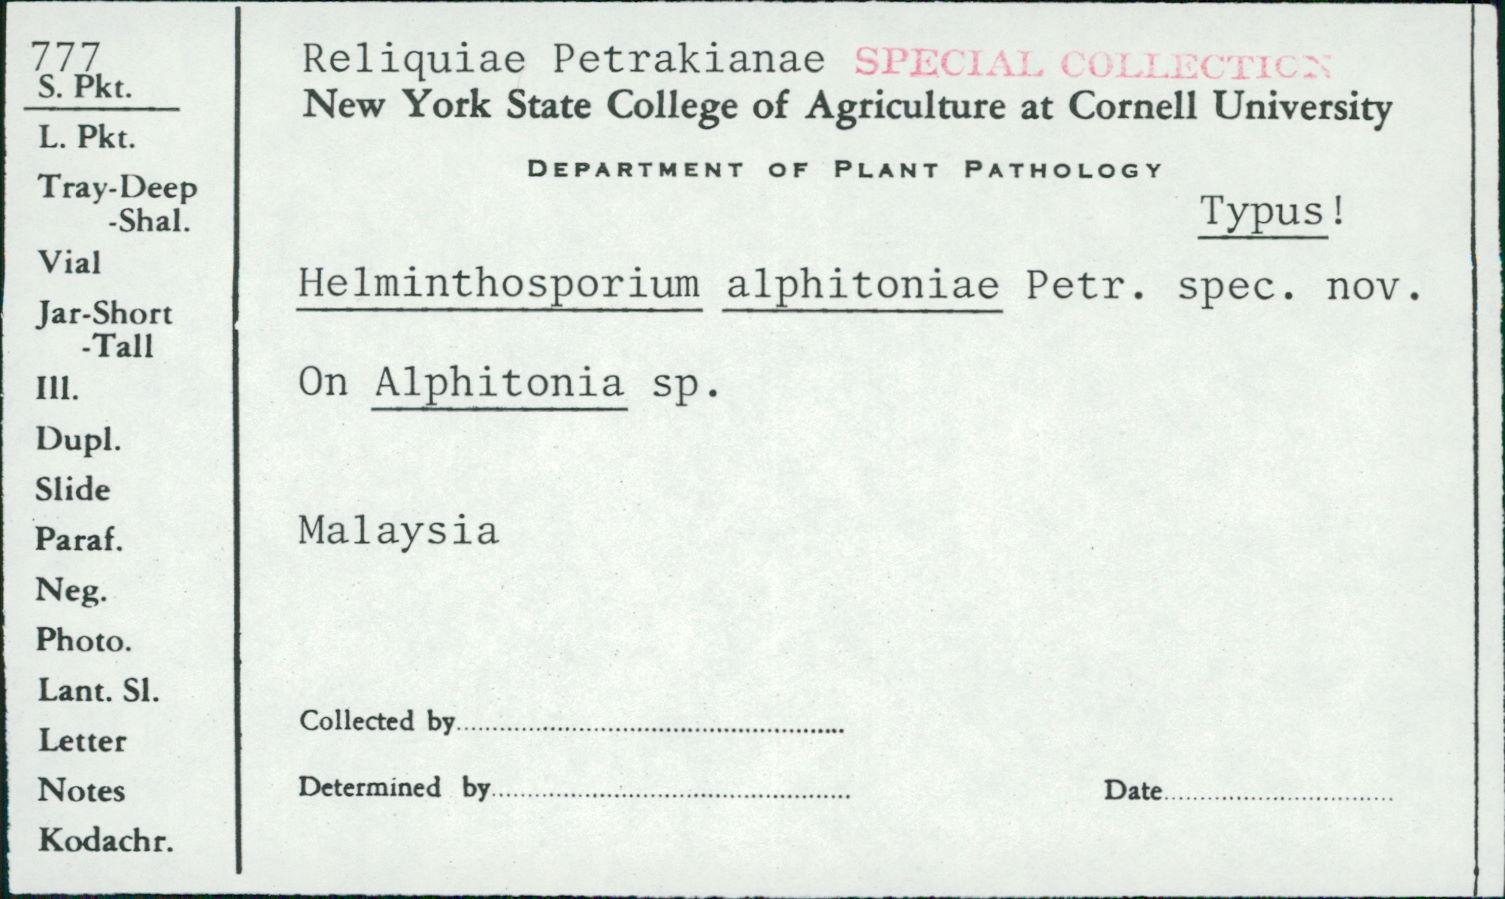 Helminthosporium alphitoniae image